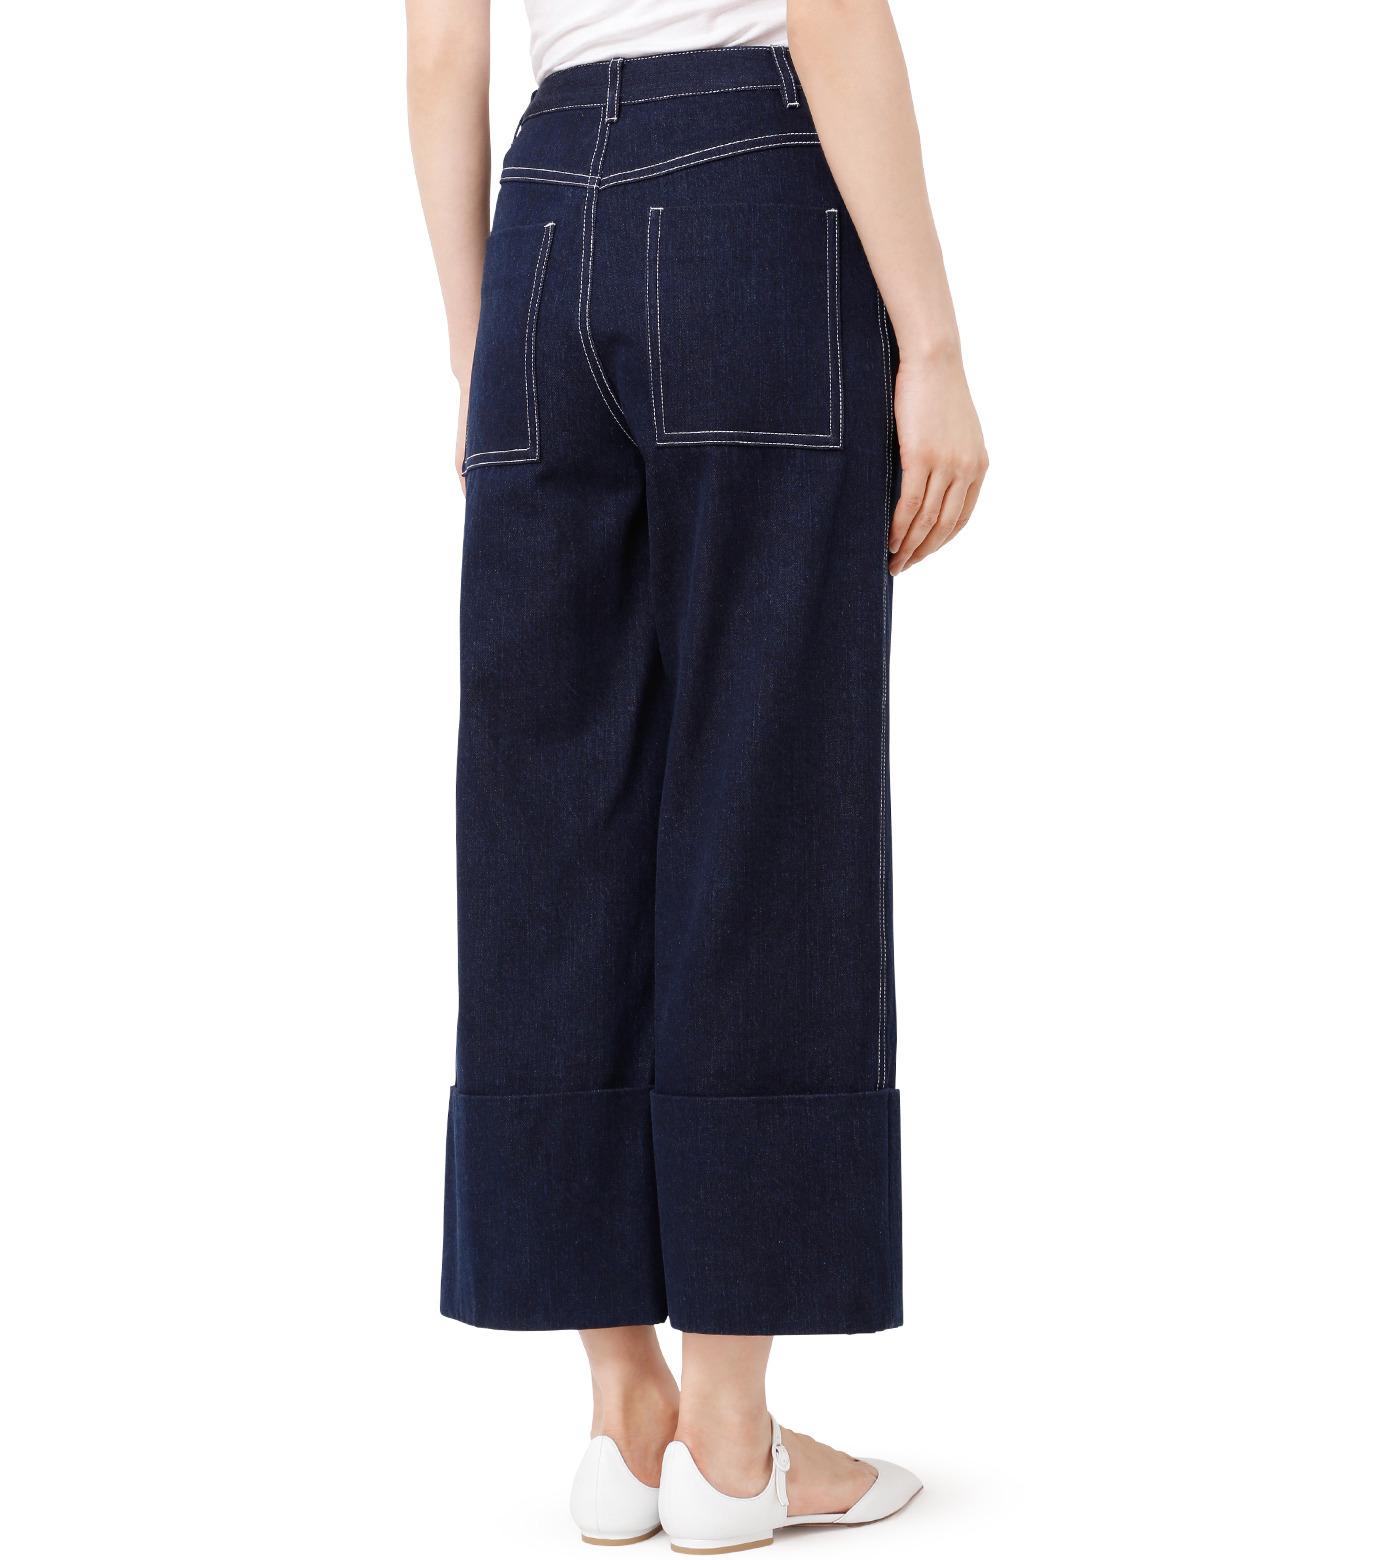 LE CIEL BLEU(ルシェルブルー)のデニムフォールドバックパンツ-INDIGO(パンツ/pants)-18A68304 拡大詳細画像2